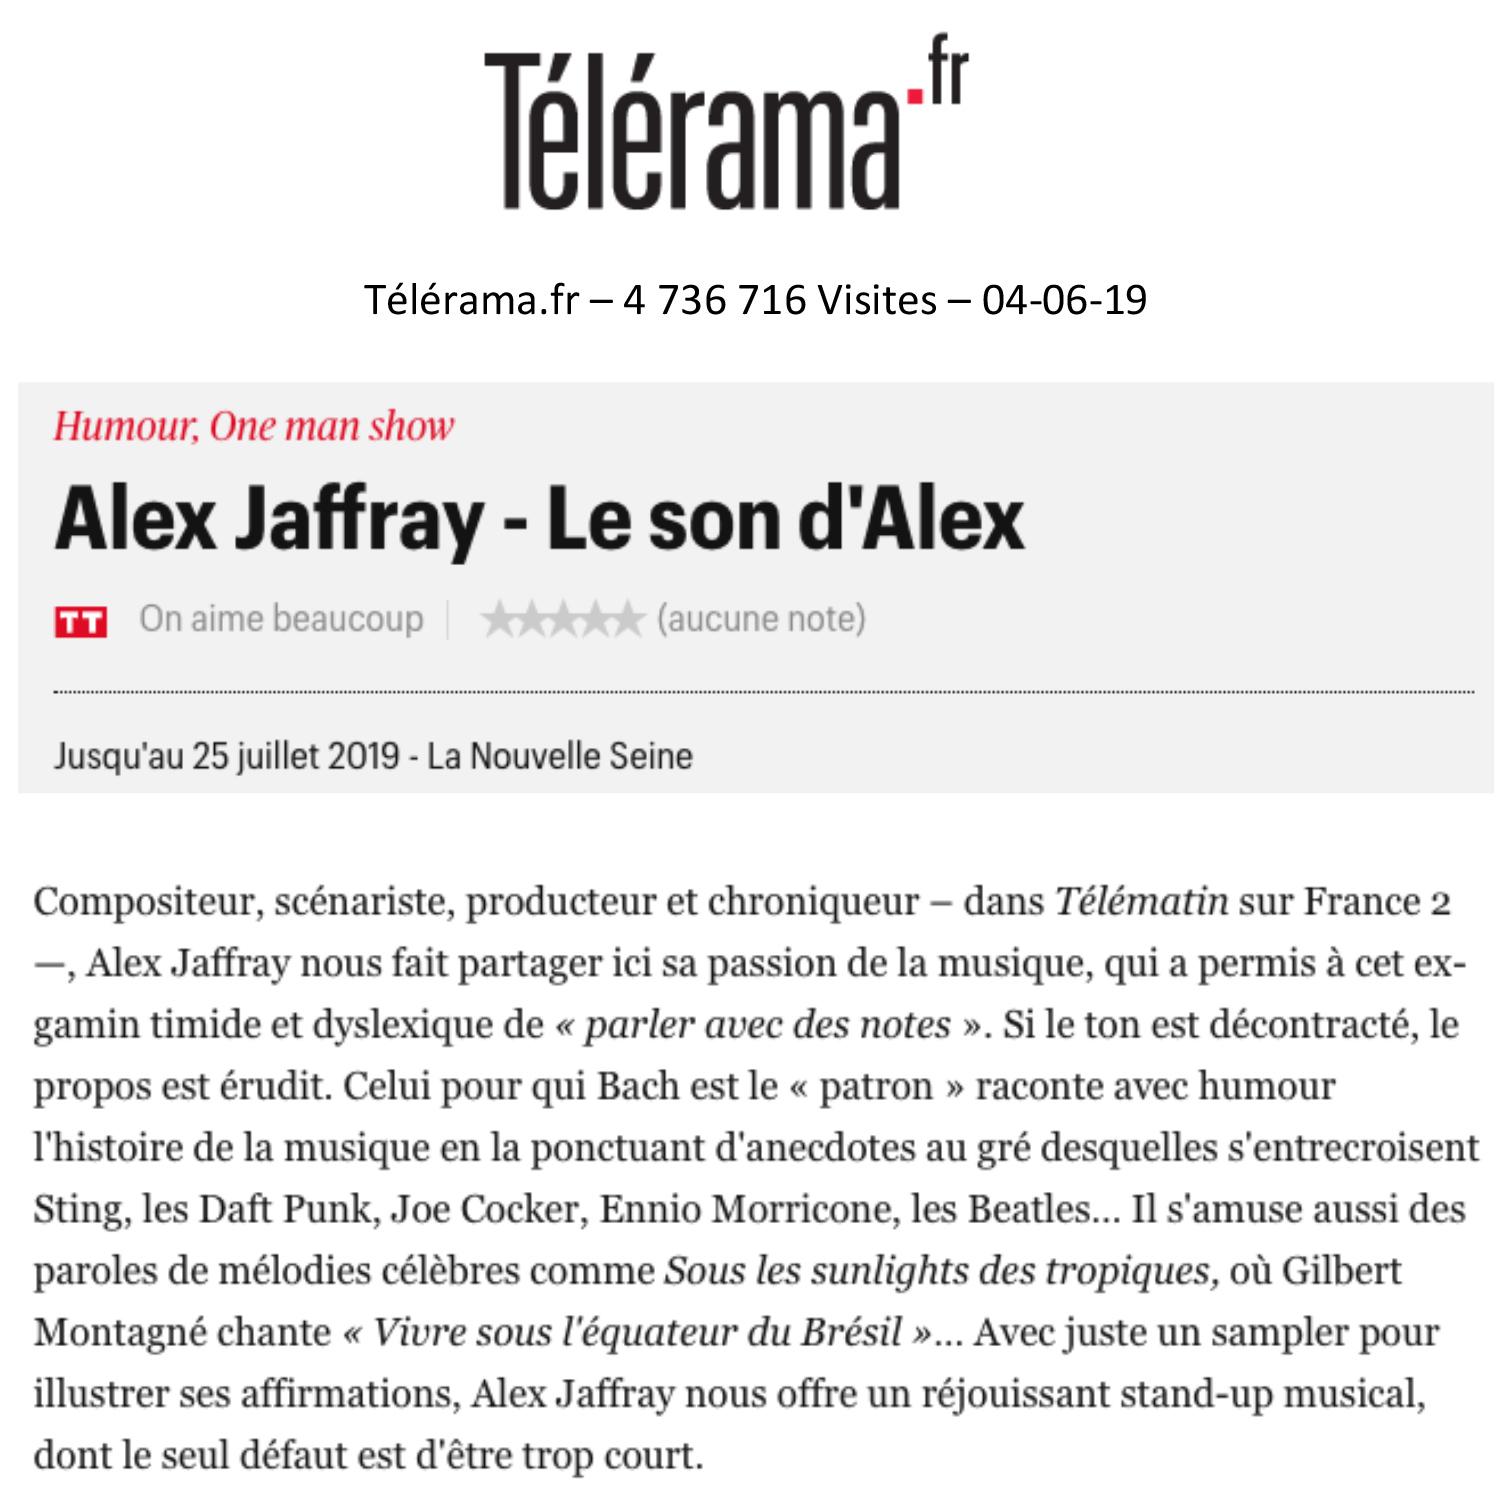 Télérama.fr 04.06.19